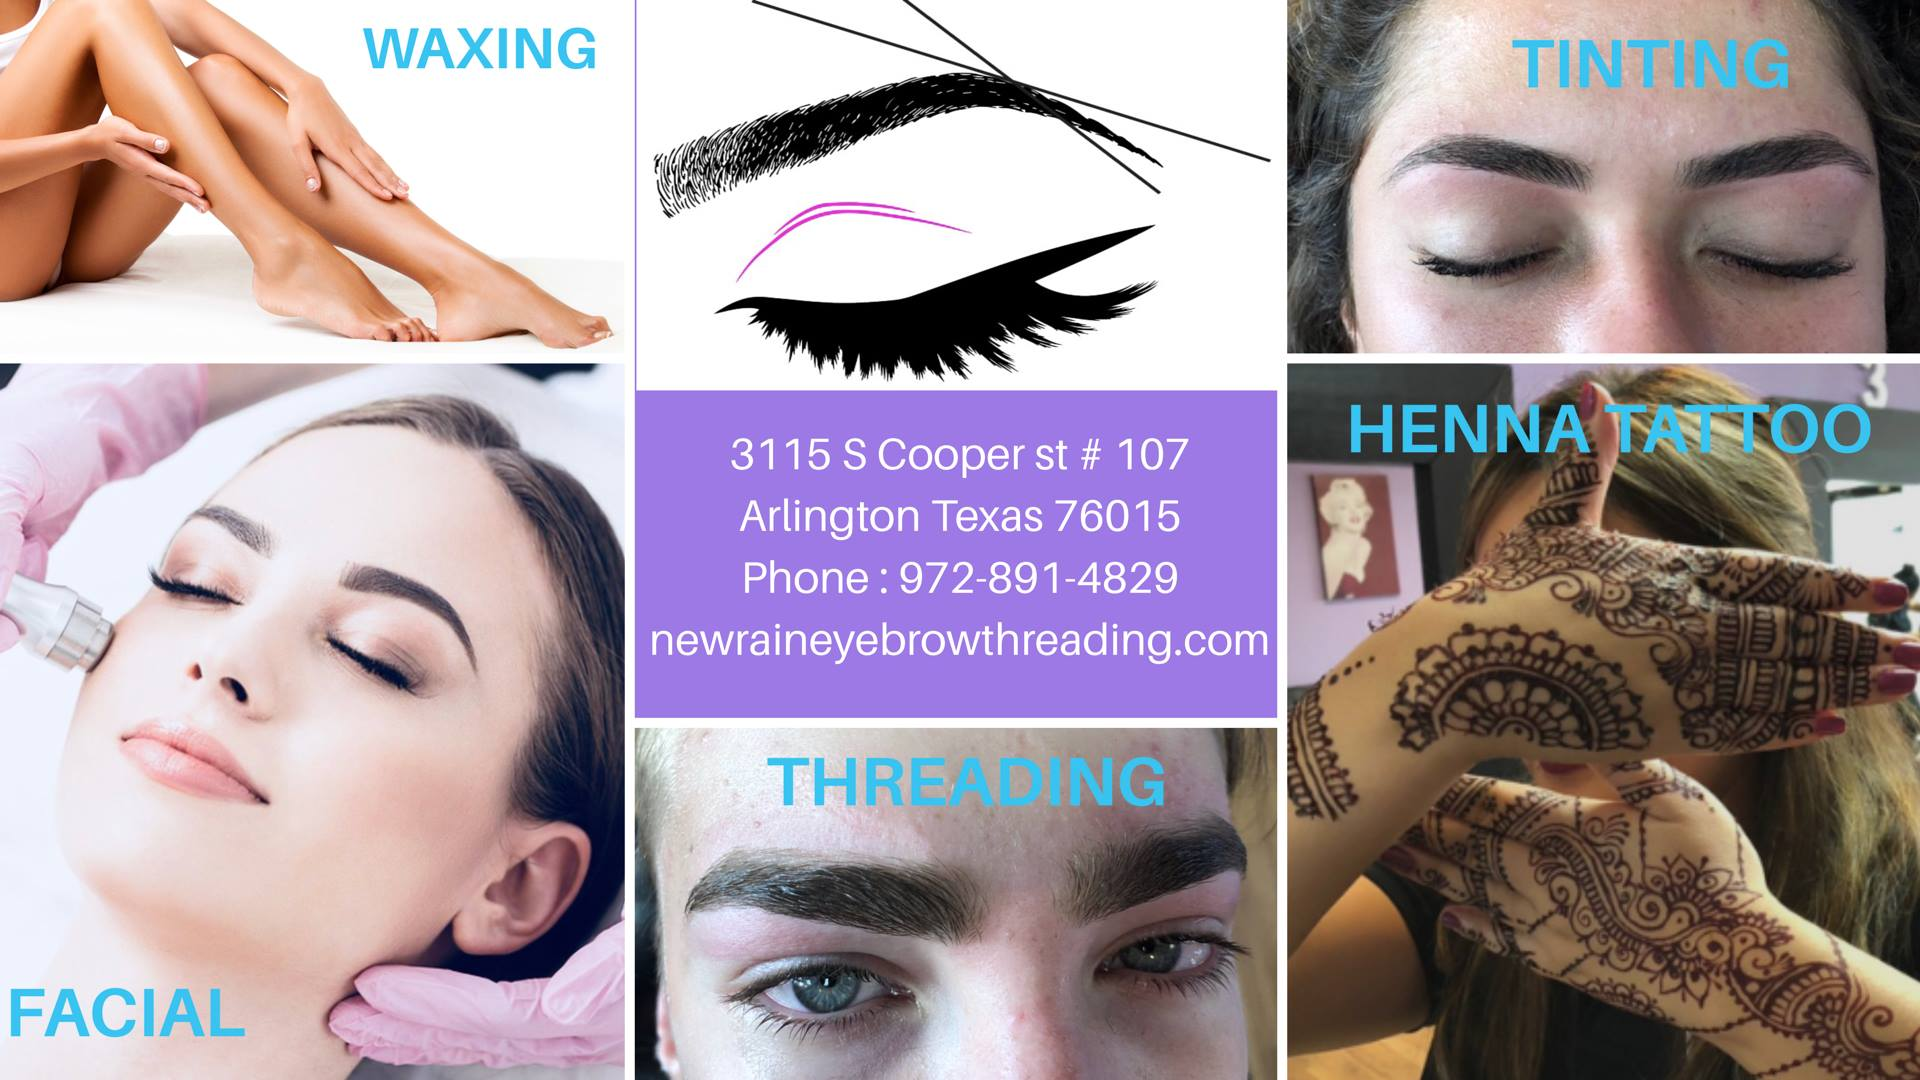 #1 Newrain Eyebrow Threading in Arlington TX - (817) 376-9780